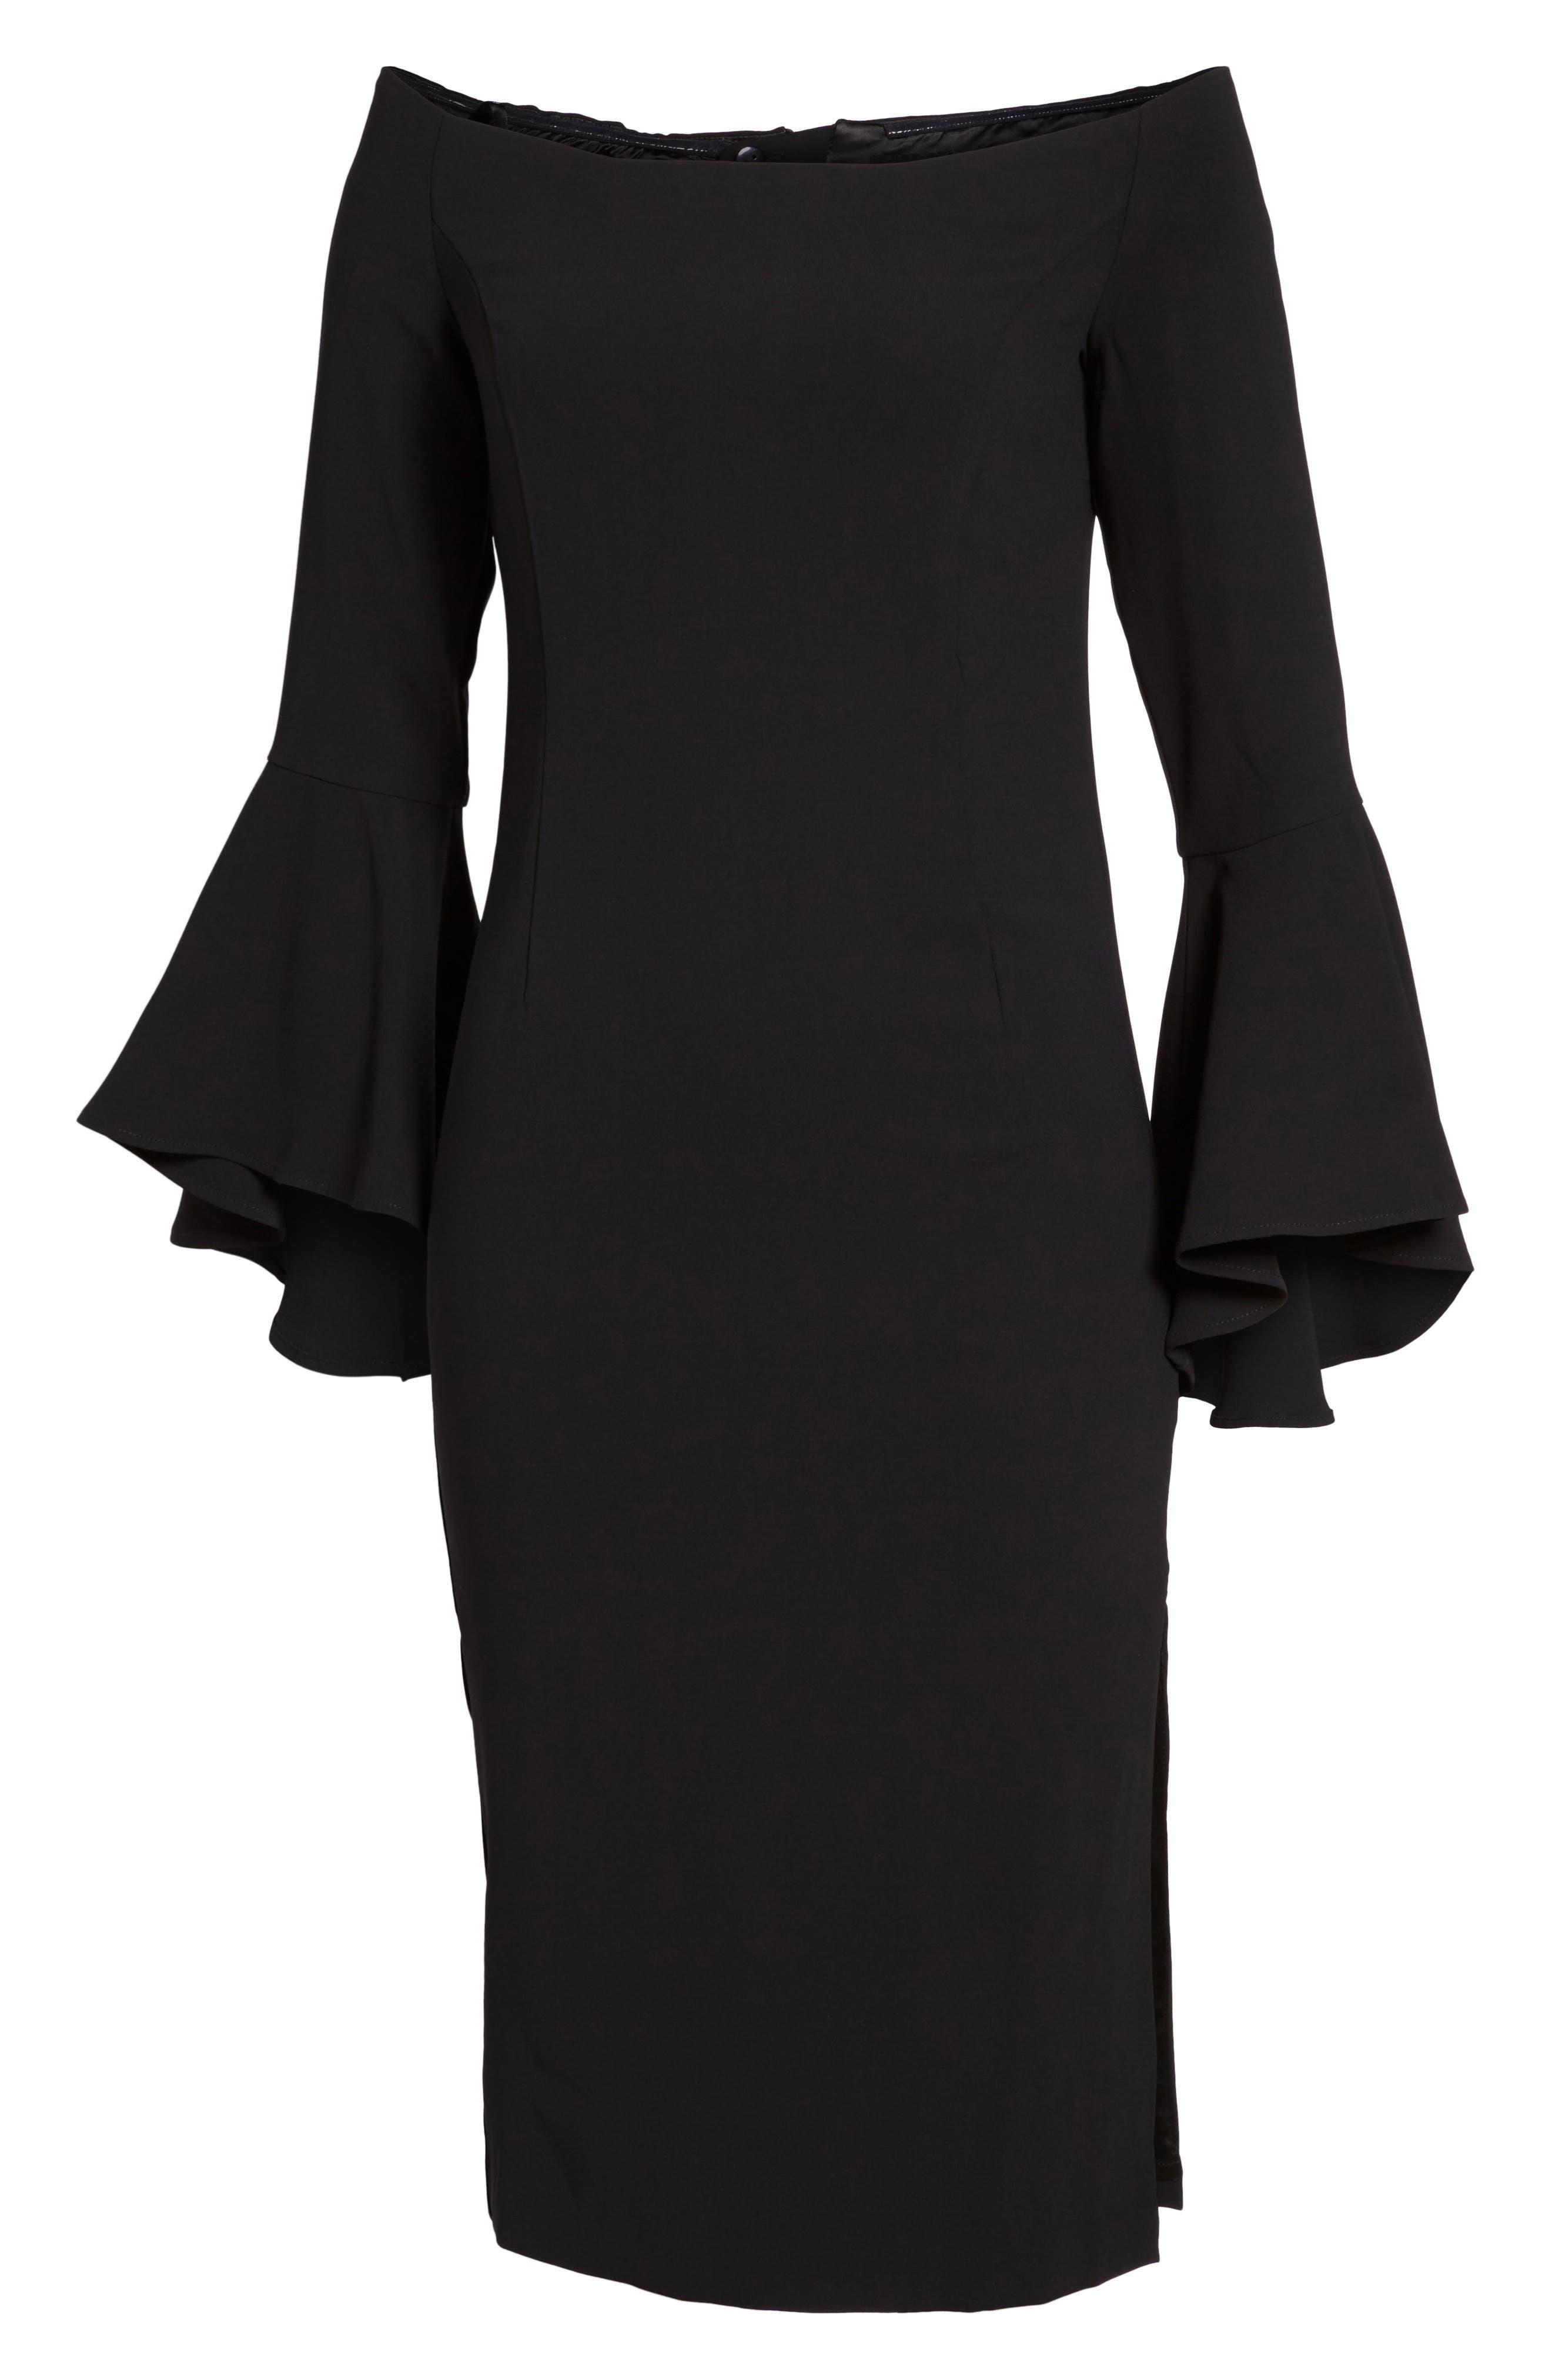 'Solange' Off the Shoulder Midi Dress,                             Main thumbnail 1, color,                             001